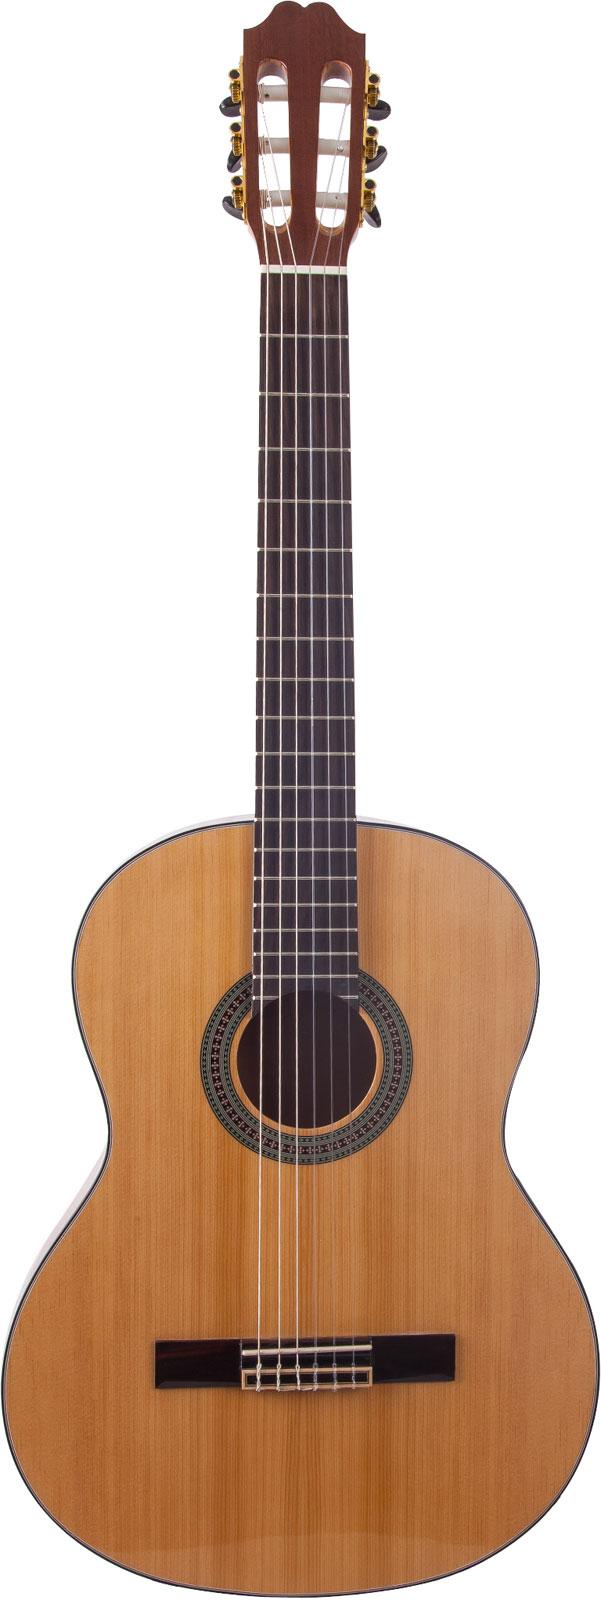 barcelona cg35 guitare classique 1-2 marron